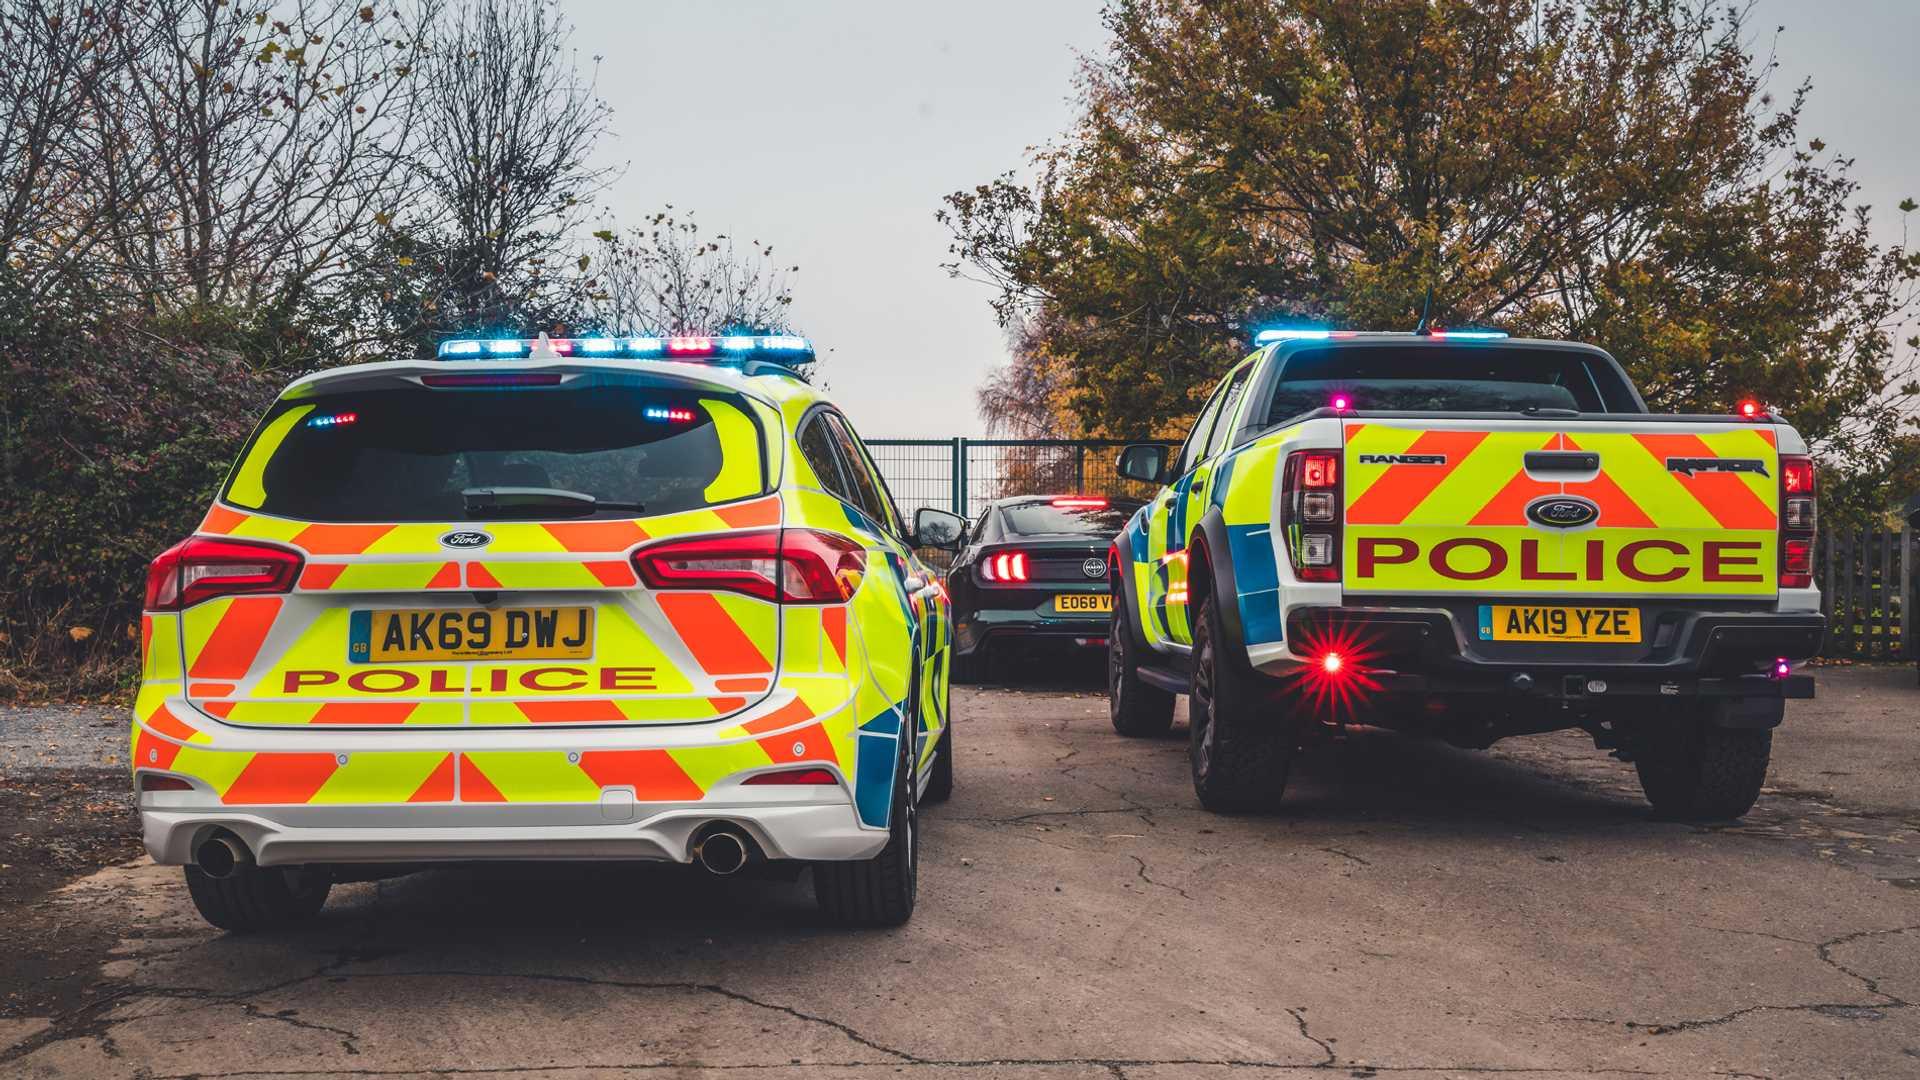 Ford-Focus-ST-and-Ranger-Raptor-UK-police-cars-2